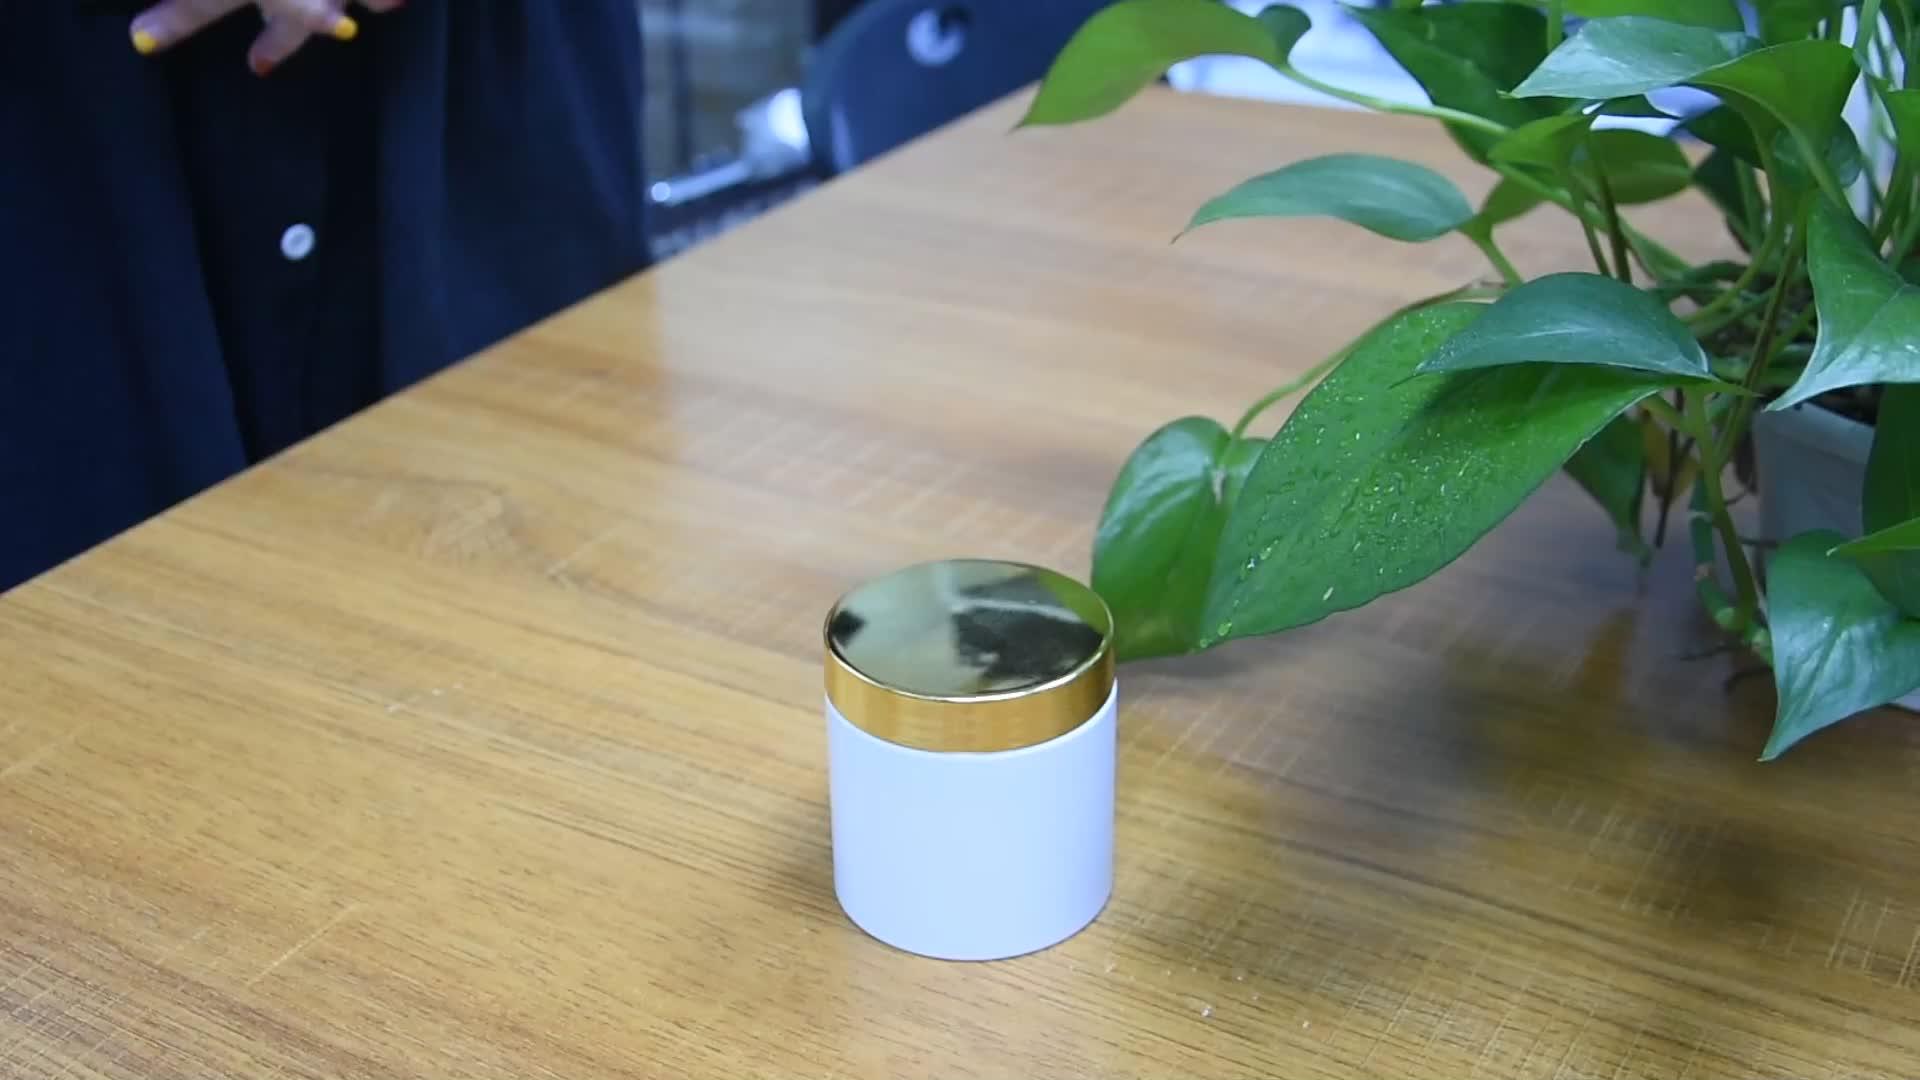 सफेद 200g पालतू बाल कंडीशनर पैकेजिंग जार प्लास्टिक कॉस्मेटिक जार त्वचा की देखभाल शरीर क्रीम कंटेनर प्लास्टिक कॉस्मेटिक पैकेजिंग